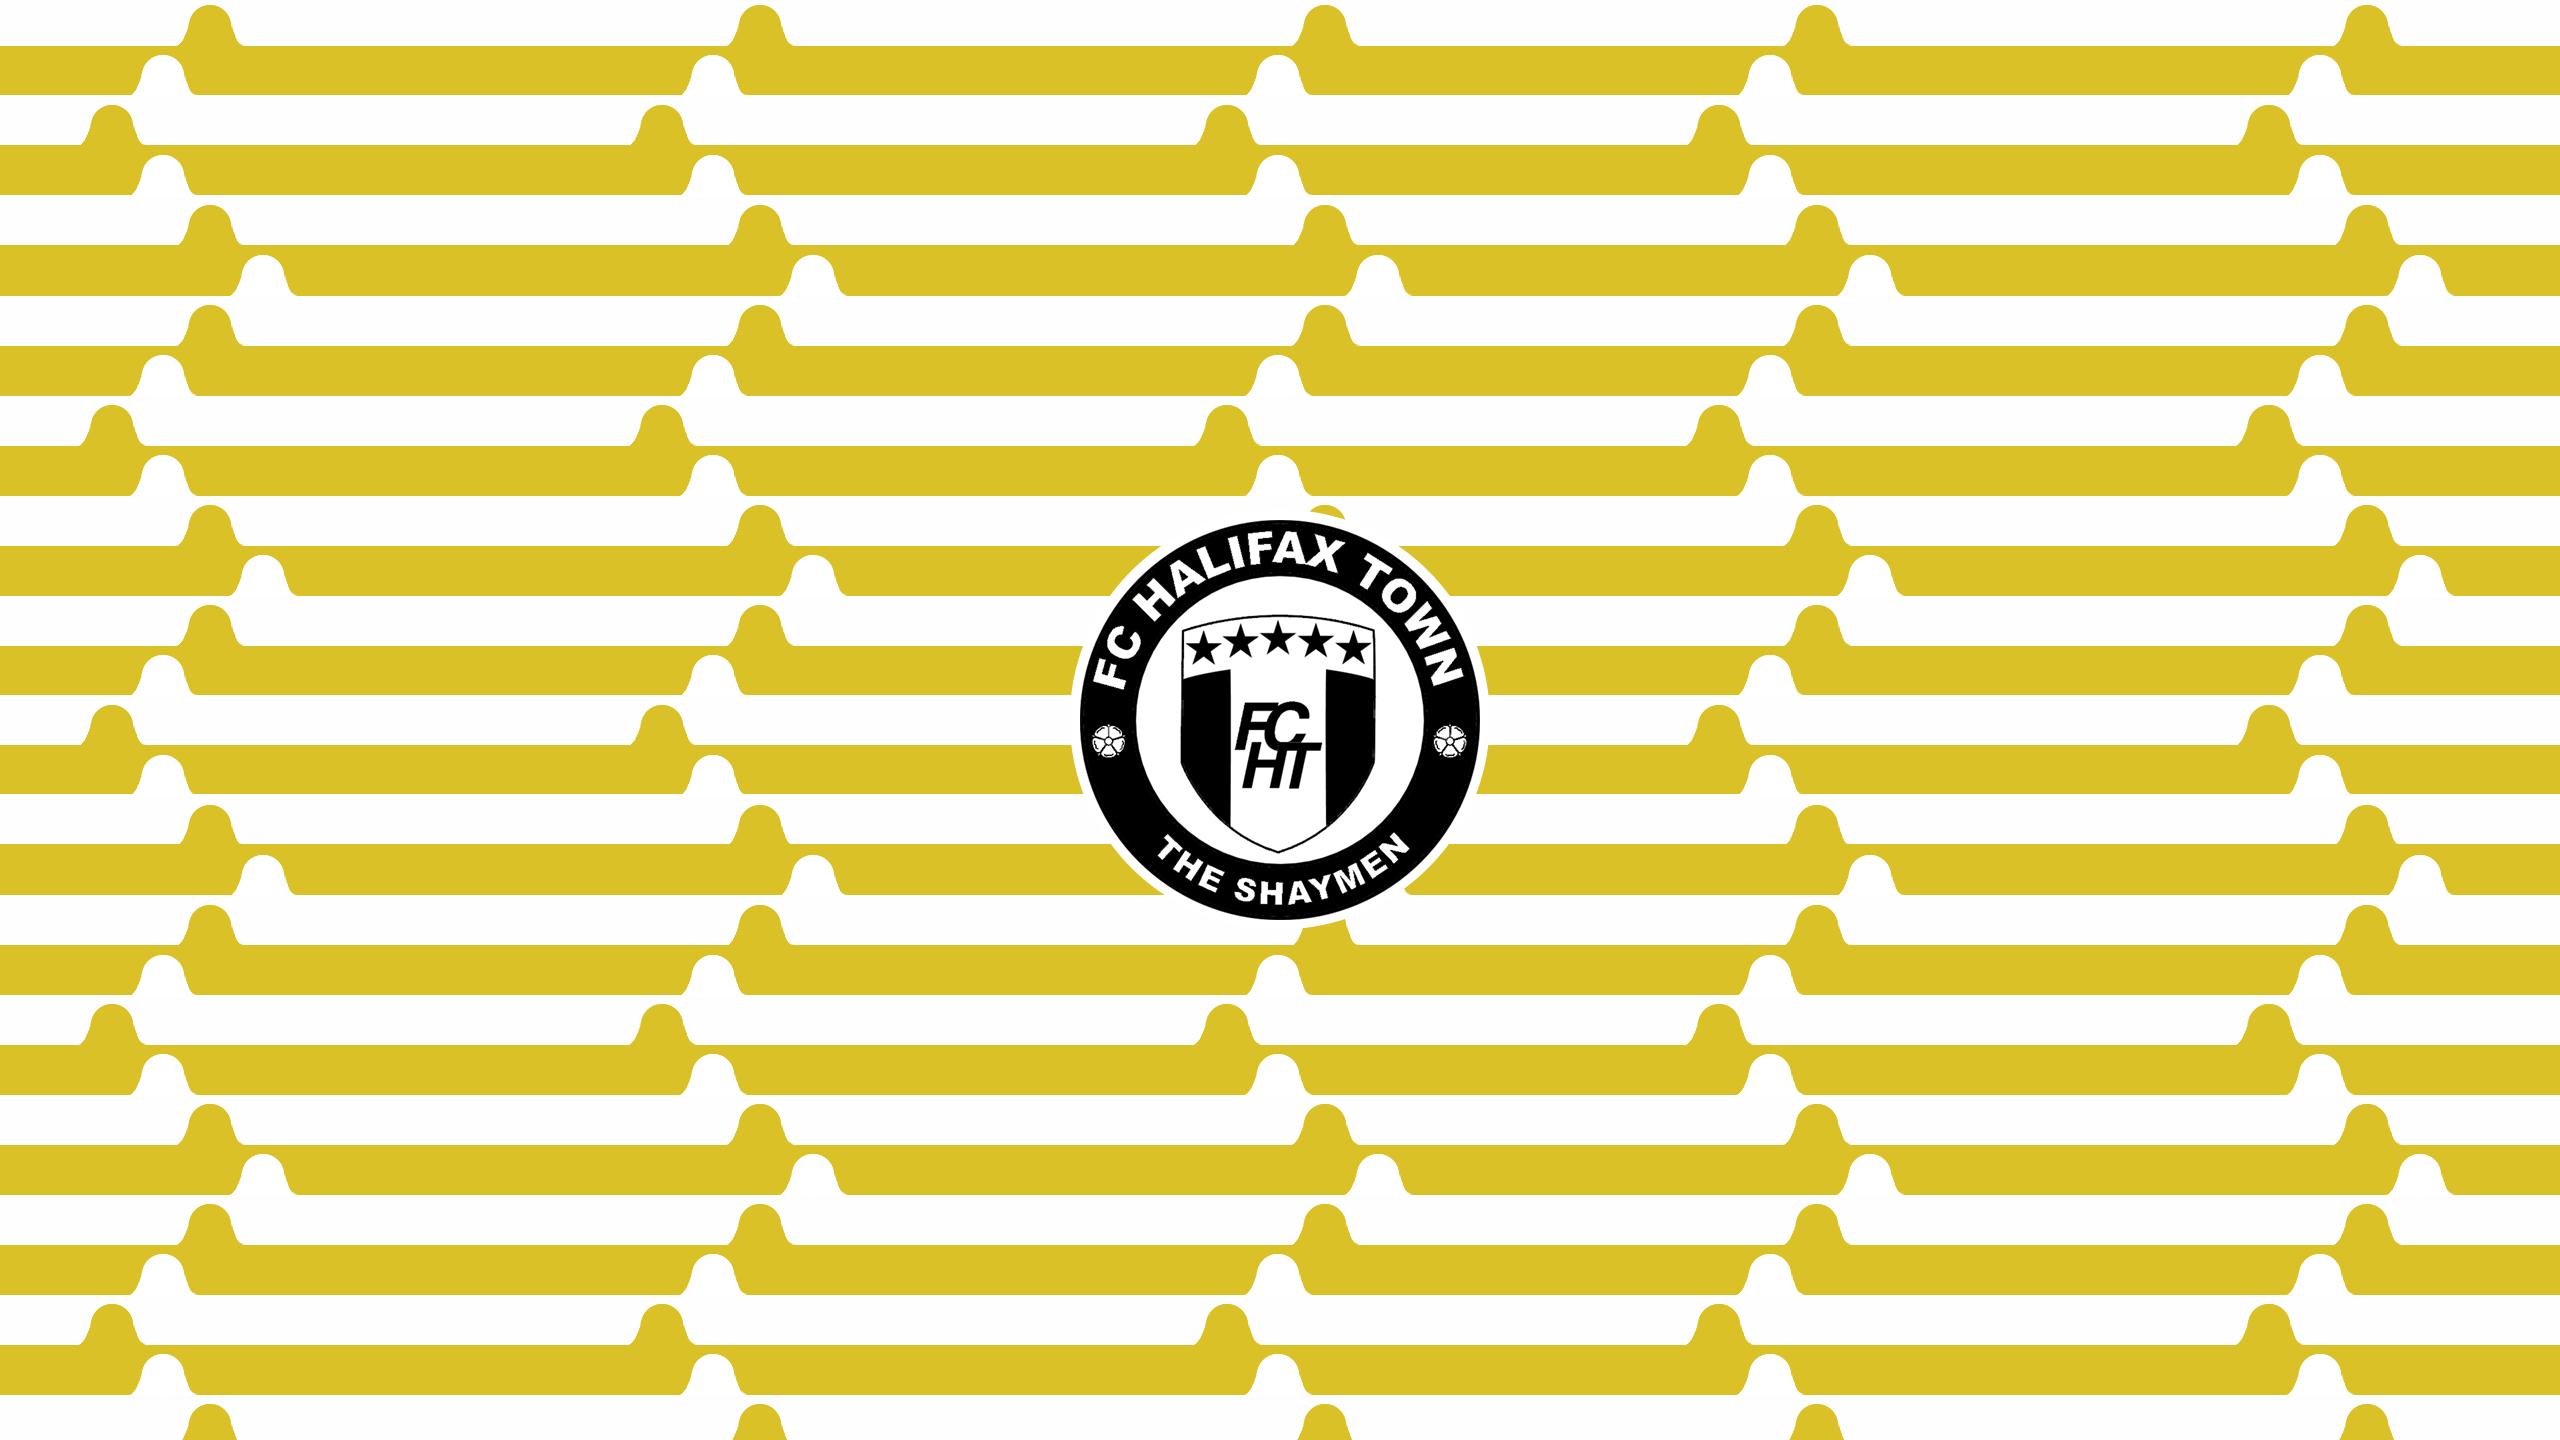 Halifax Town FC (Away)